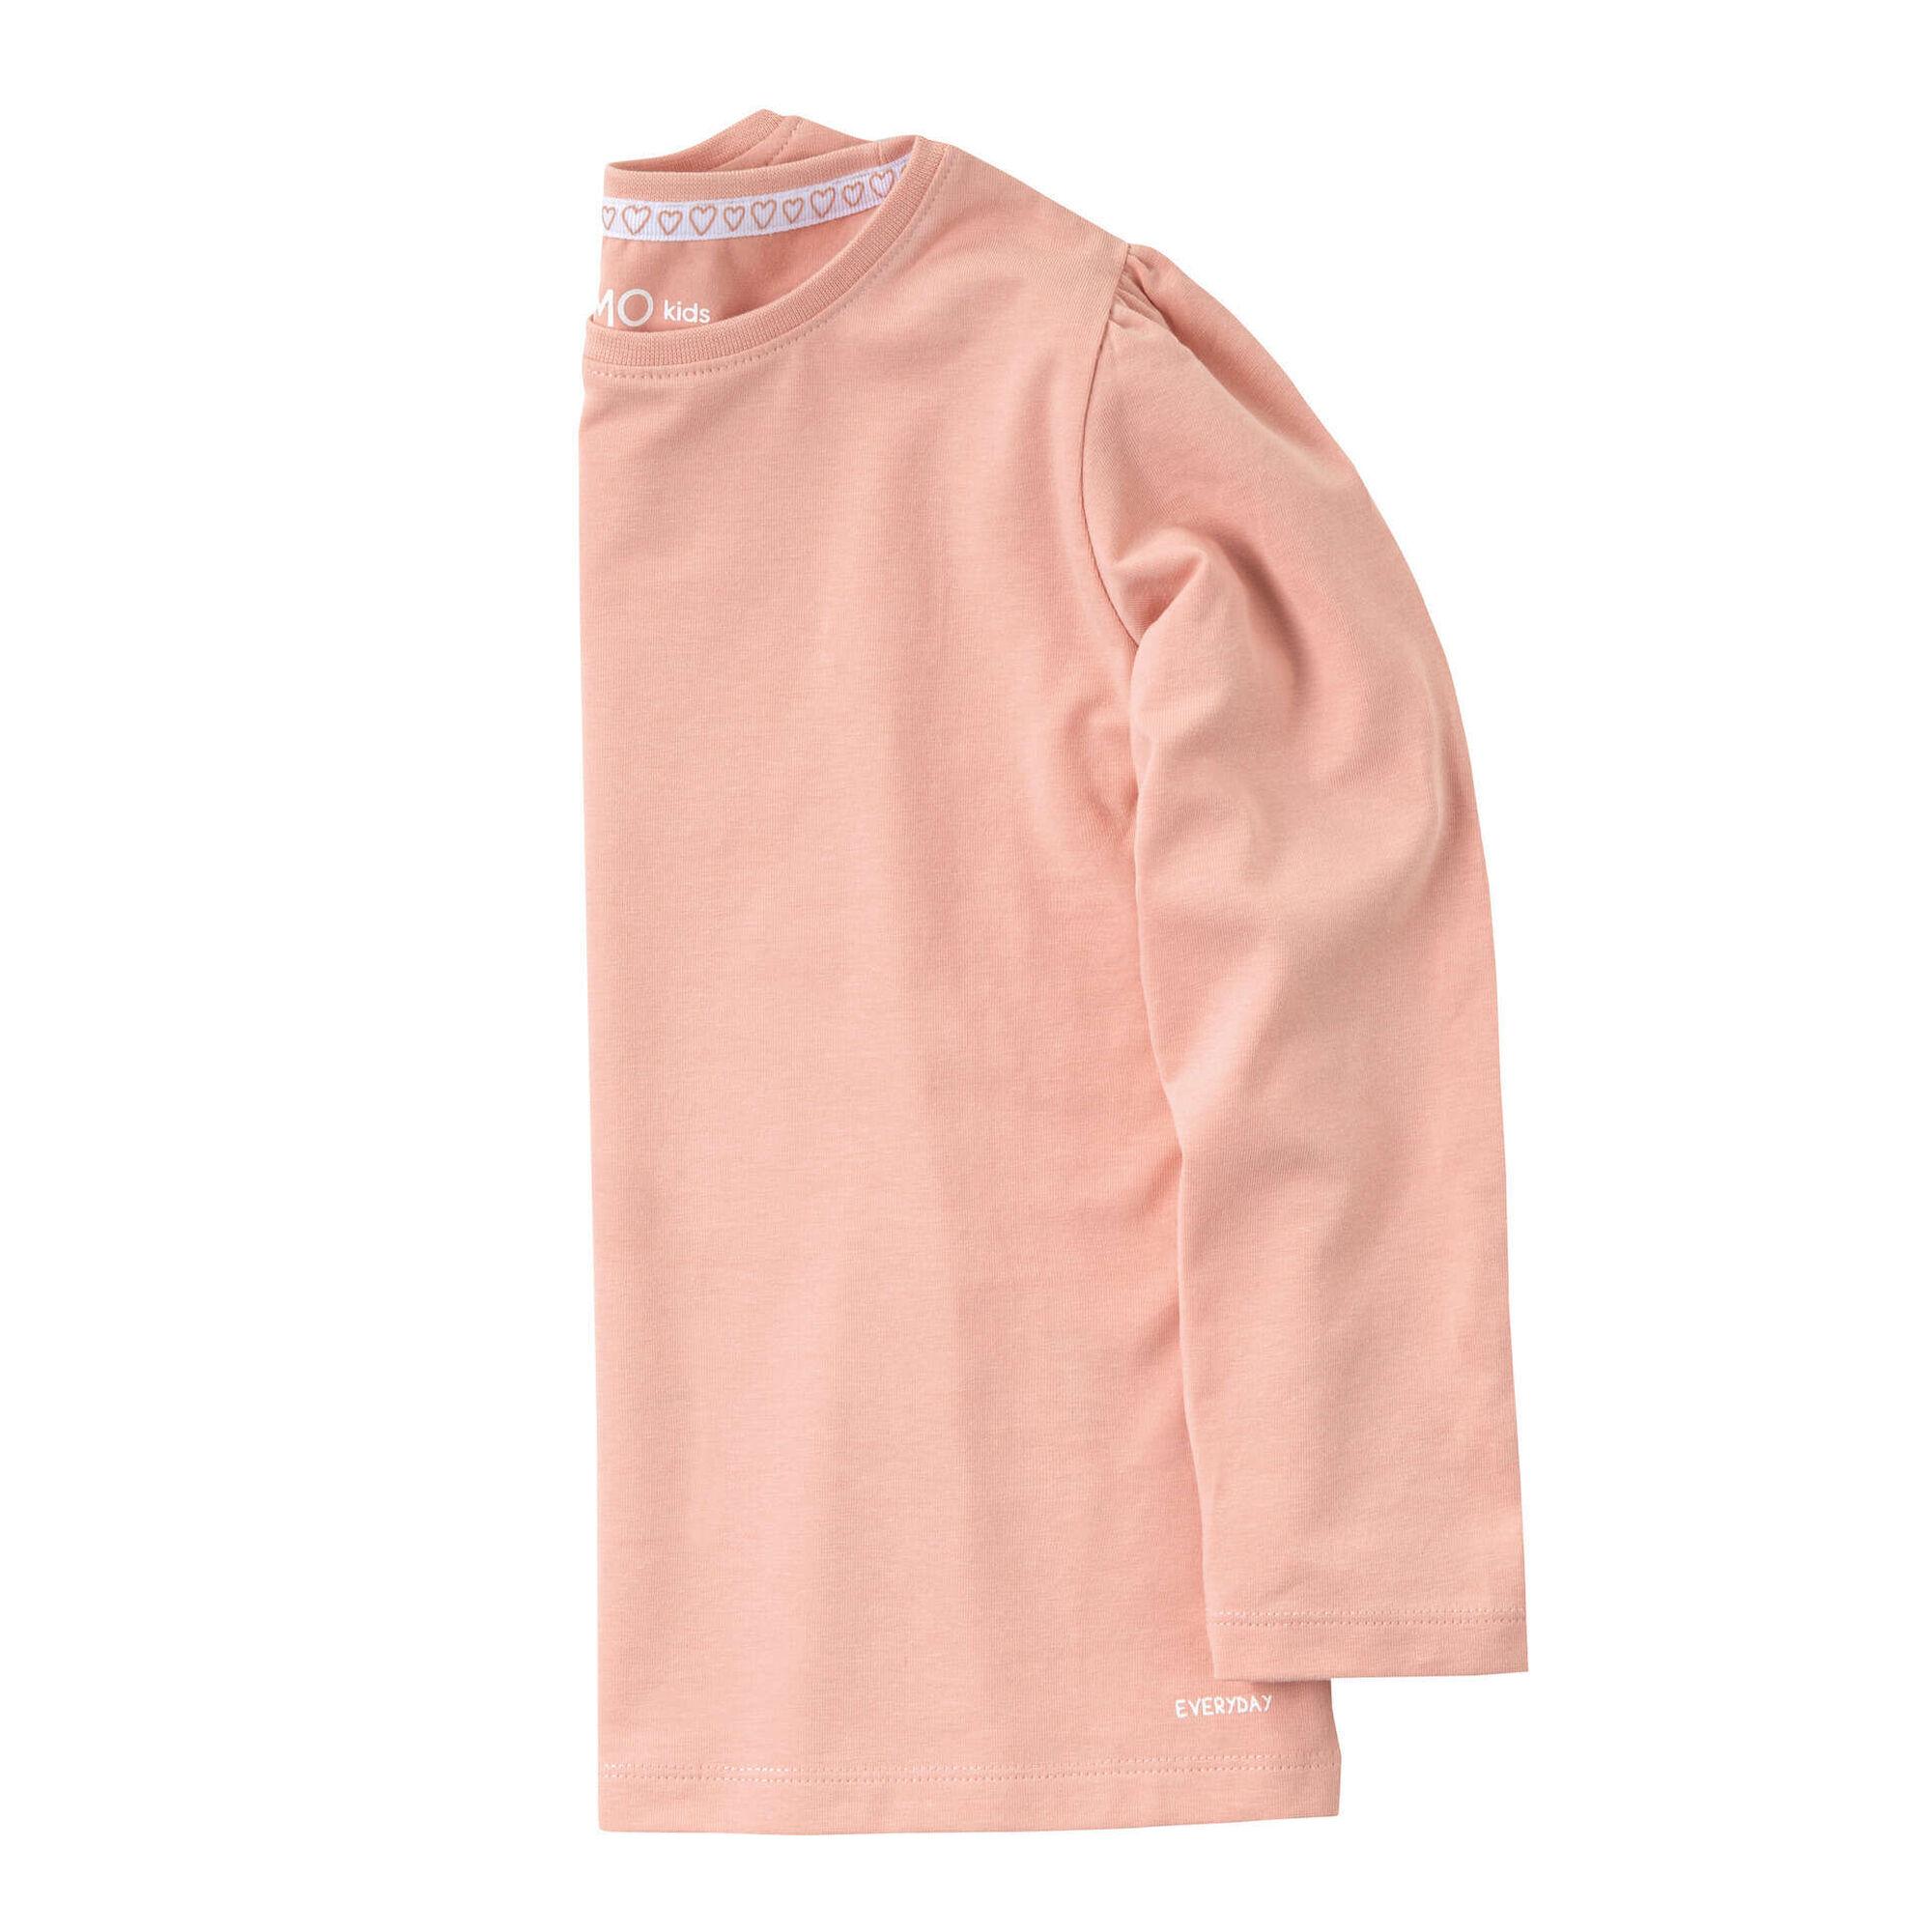 T-shirt Manga Comprida Rosa Claro